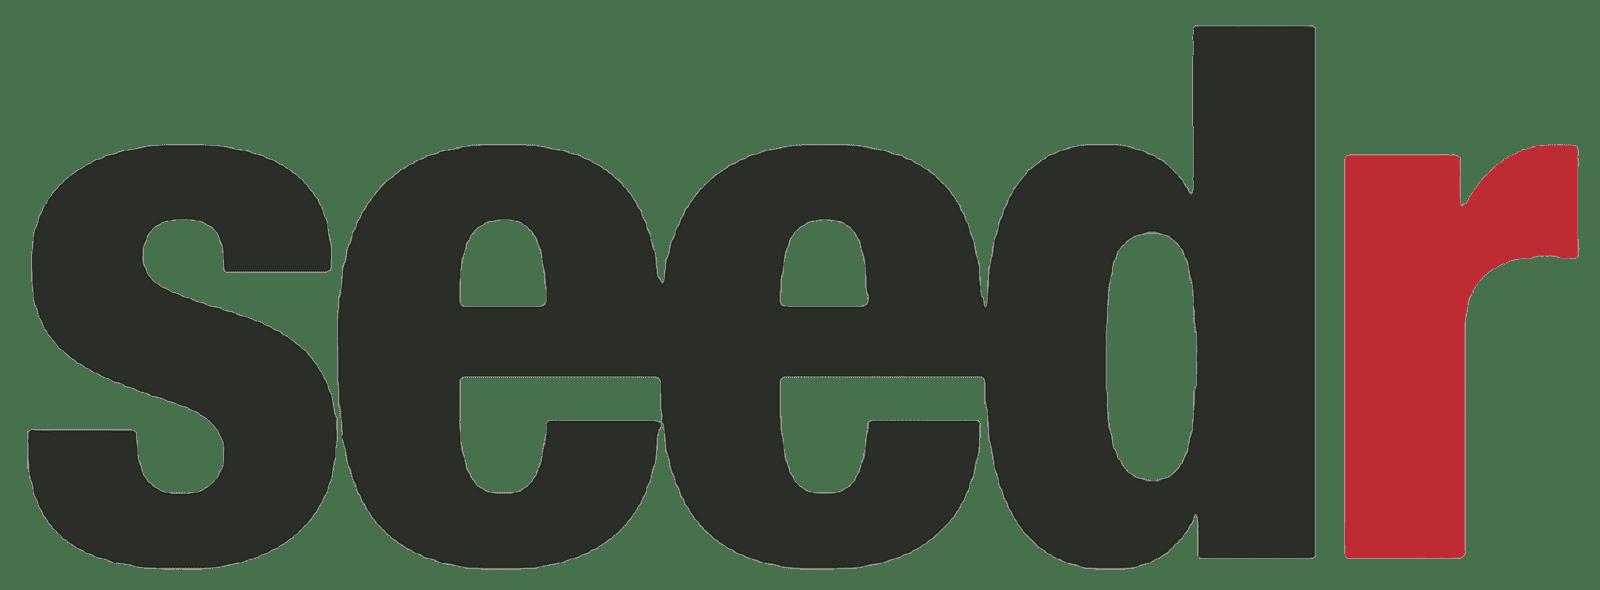 Seedr.cc Logo Main